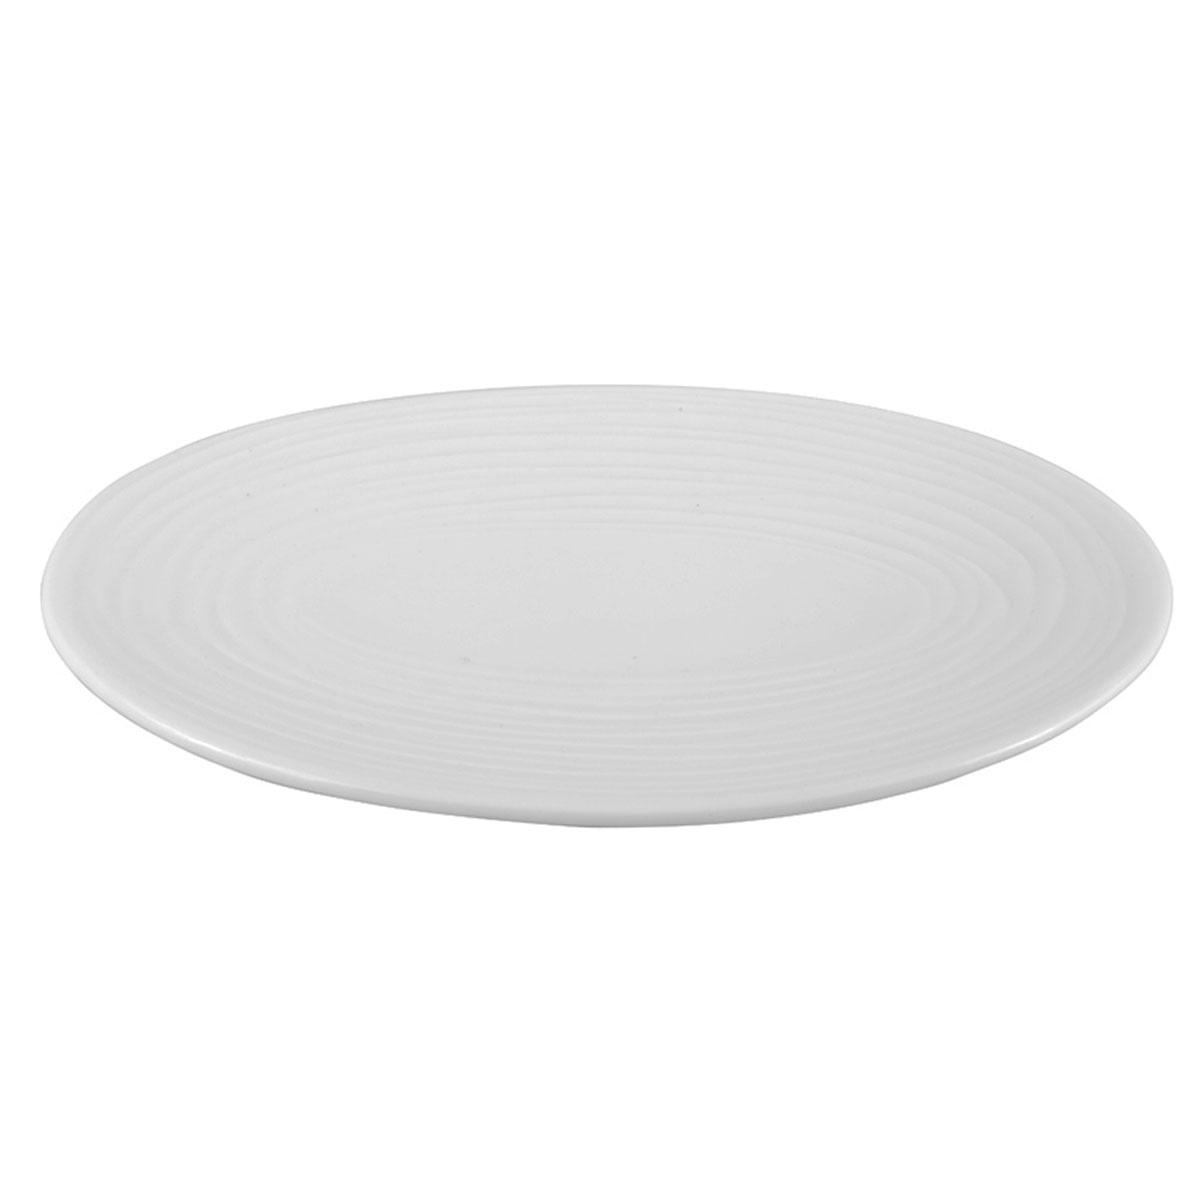 Porte savon en porcelaine rayée (Blanc)